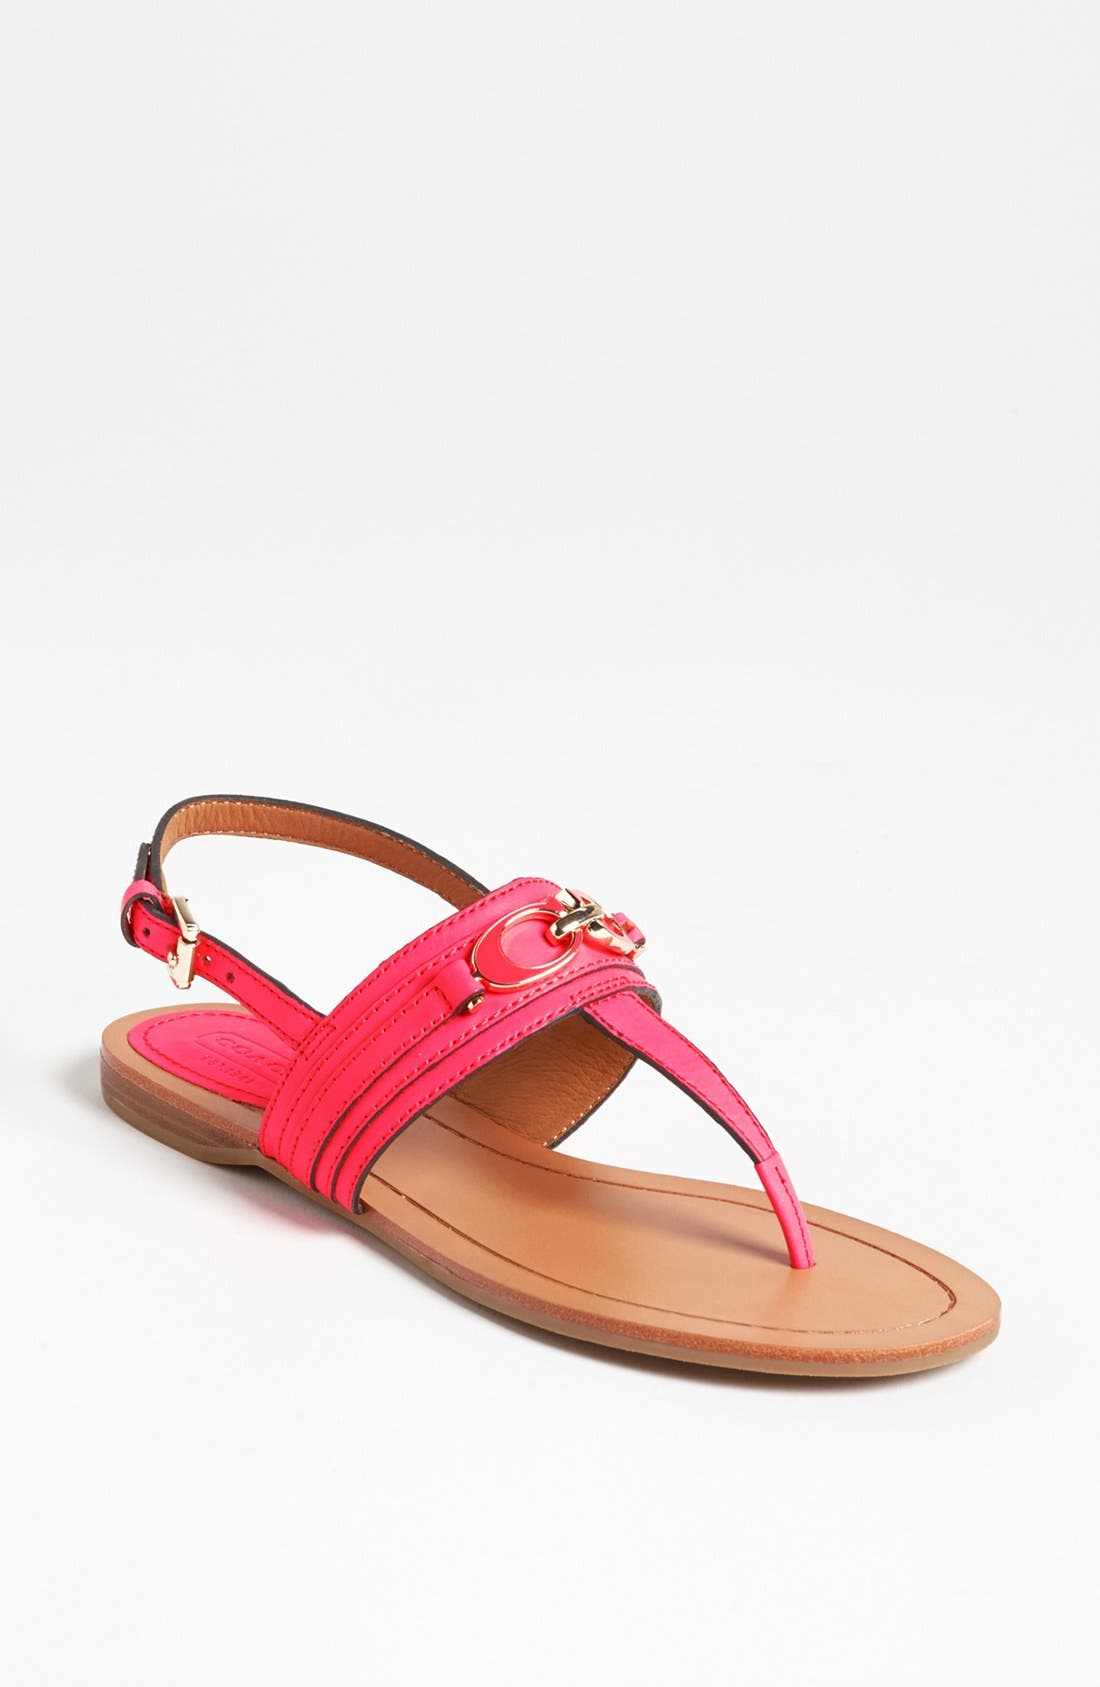 Main Image - COACH 'Sammy' Sandal